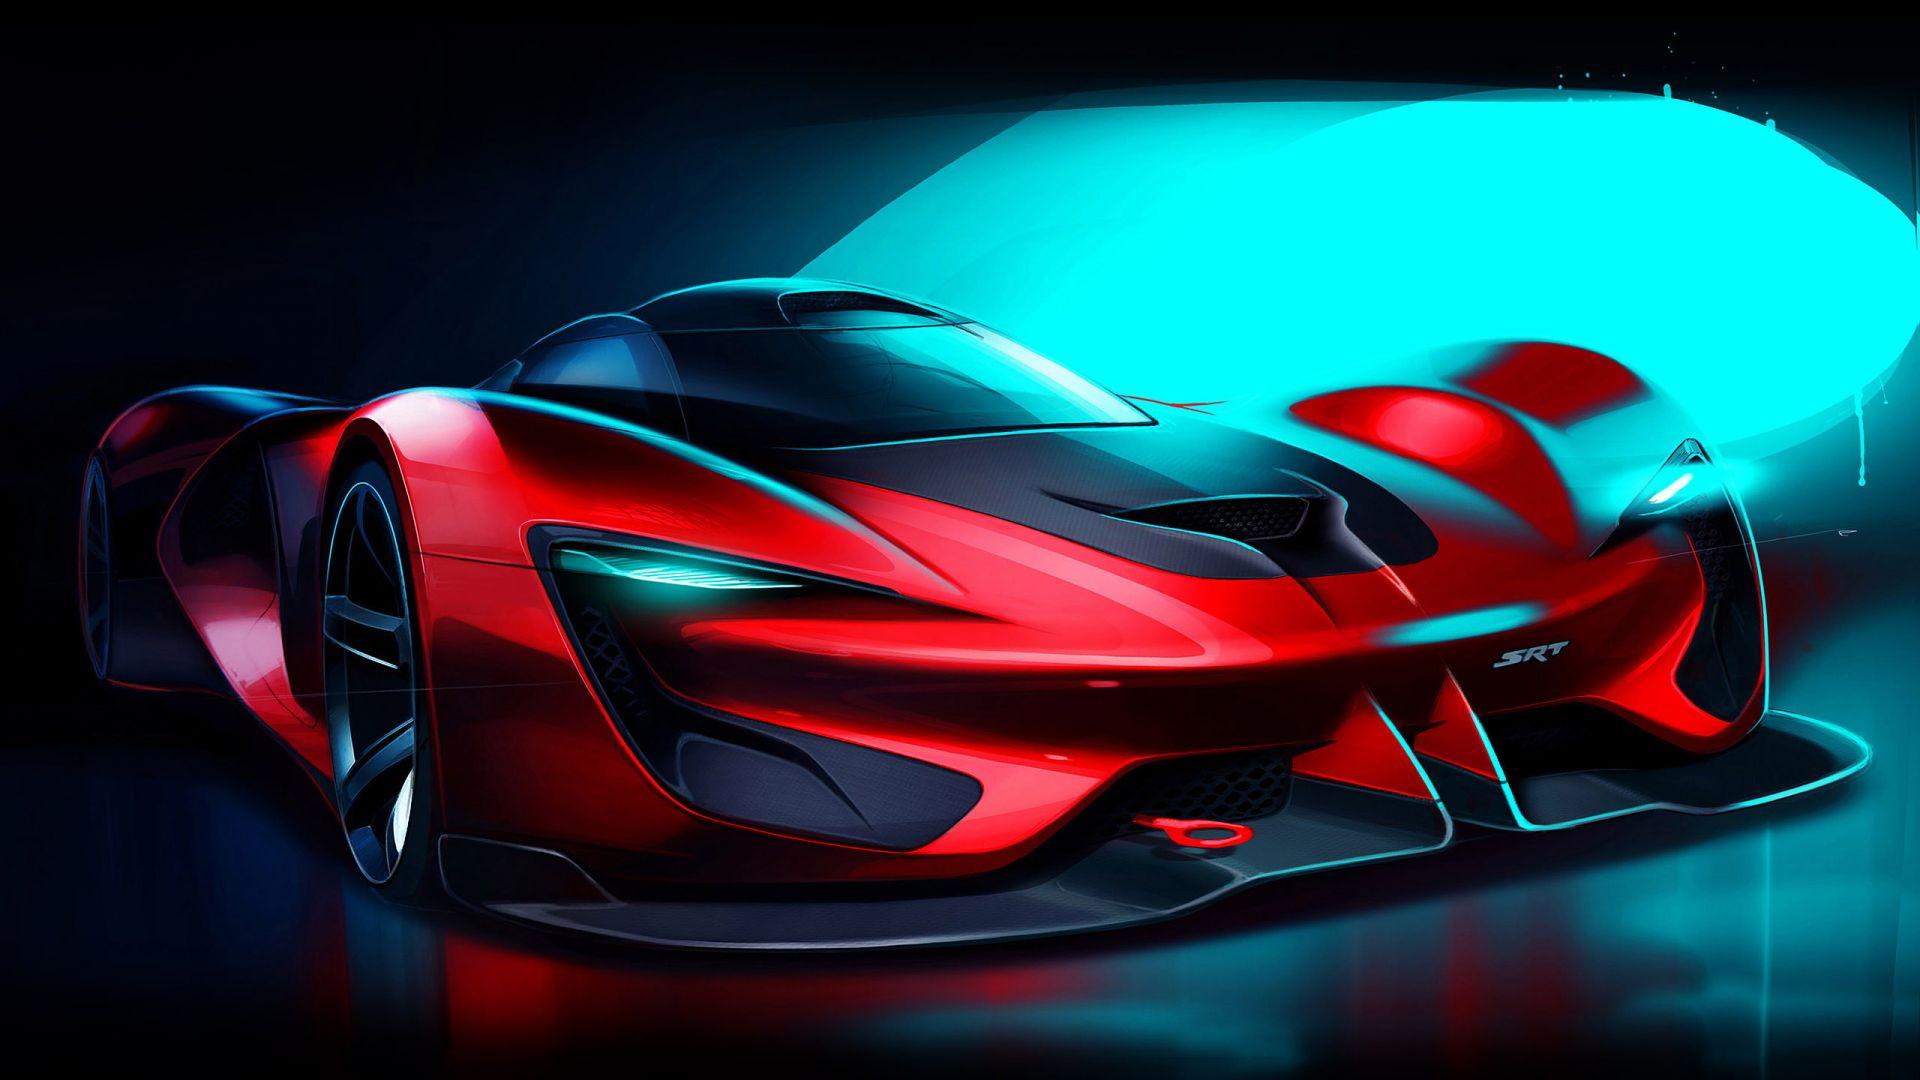 Desktop Wallpaper Dodge Srt Tomahawk Sports Car Artwork Hd Image